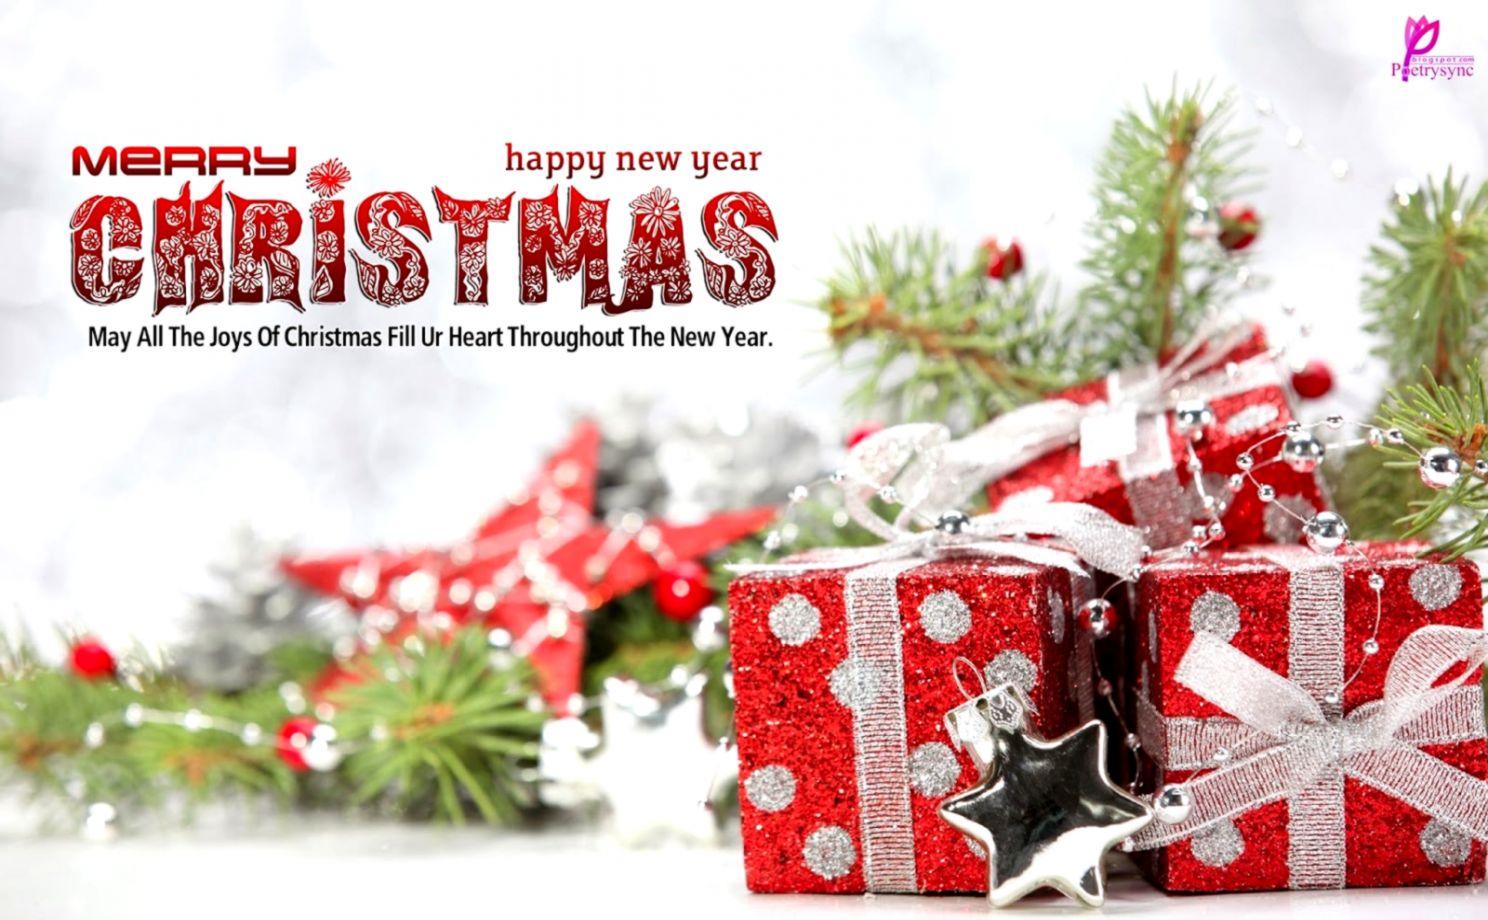 Merry Christmas Wallpaper.Gift Merry Christmas Wallpaper Desktop Info Wallpapers